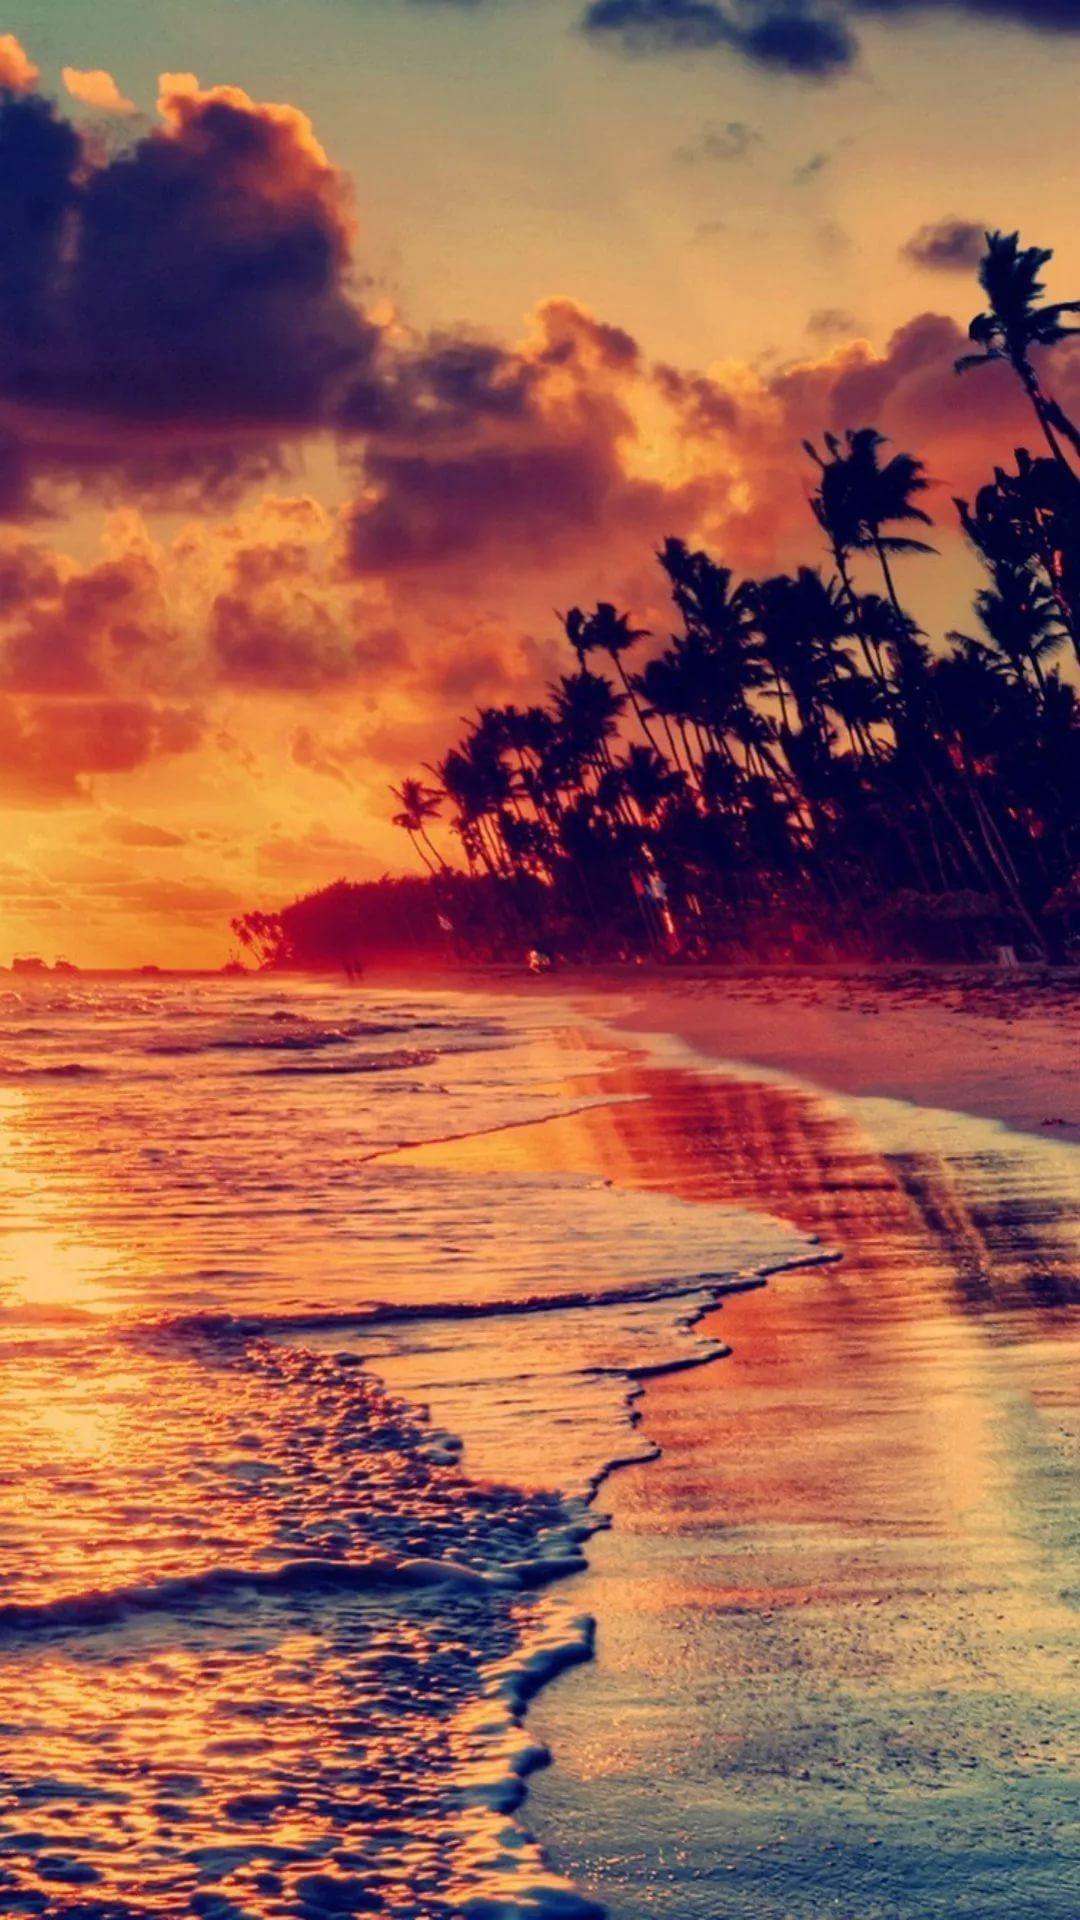 Beautiful Sunset screen saver wallpaper